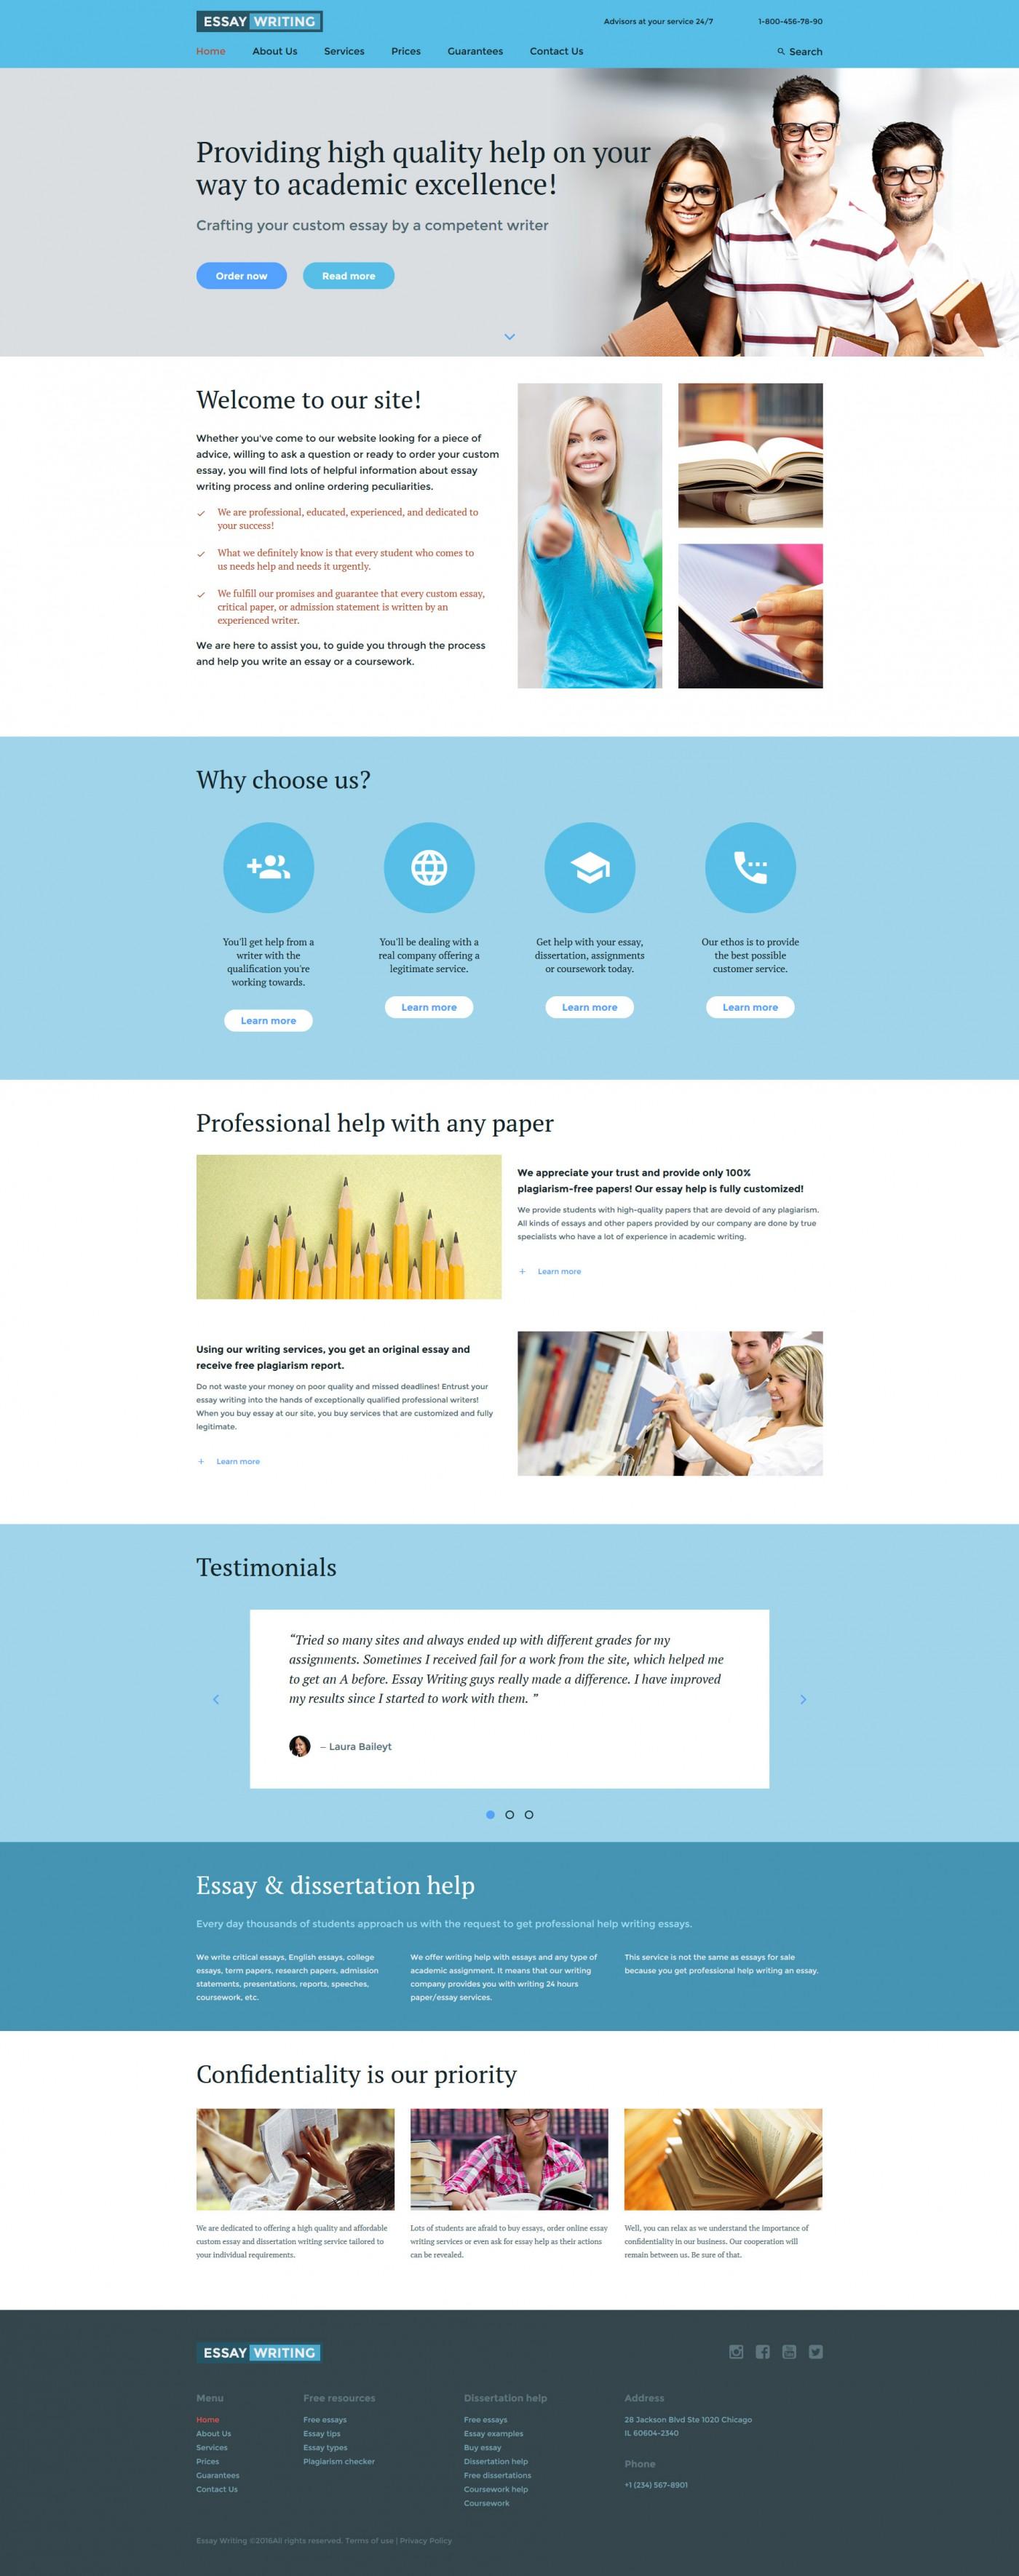 Essay Example Best Writing Website  Thatsnotus    Essay Writing Website Best Awesome Websites Reddit